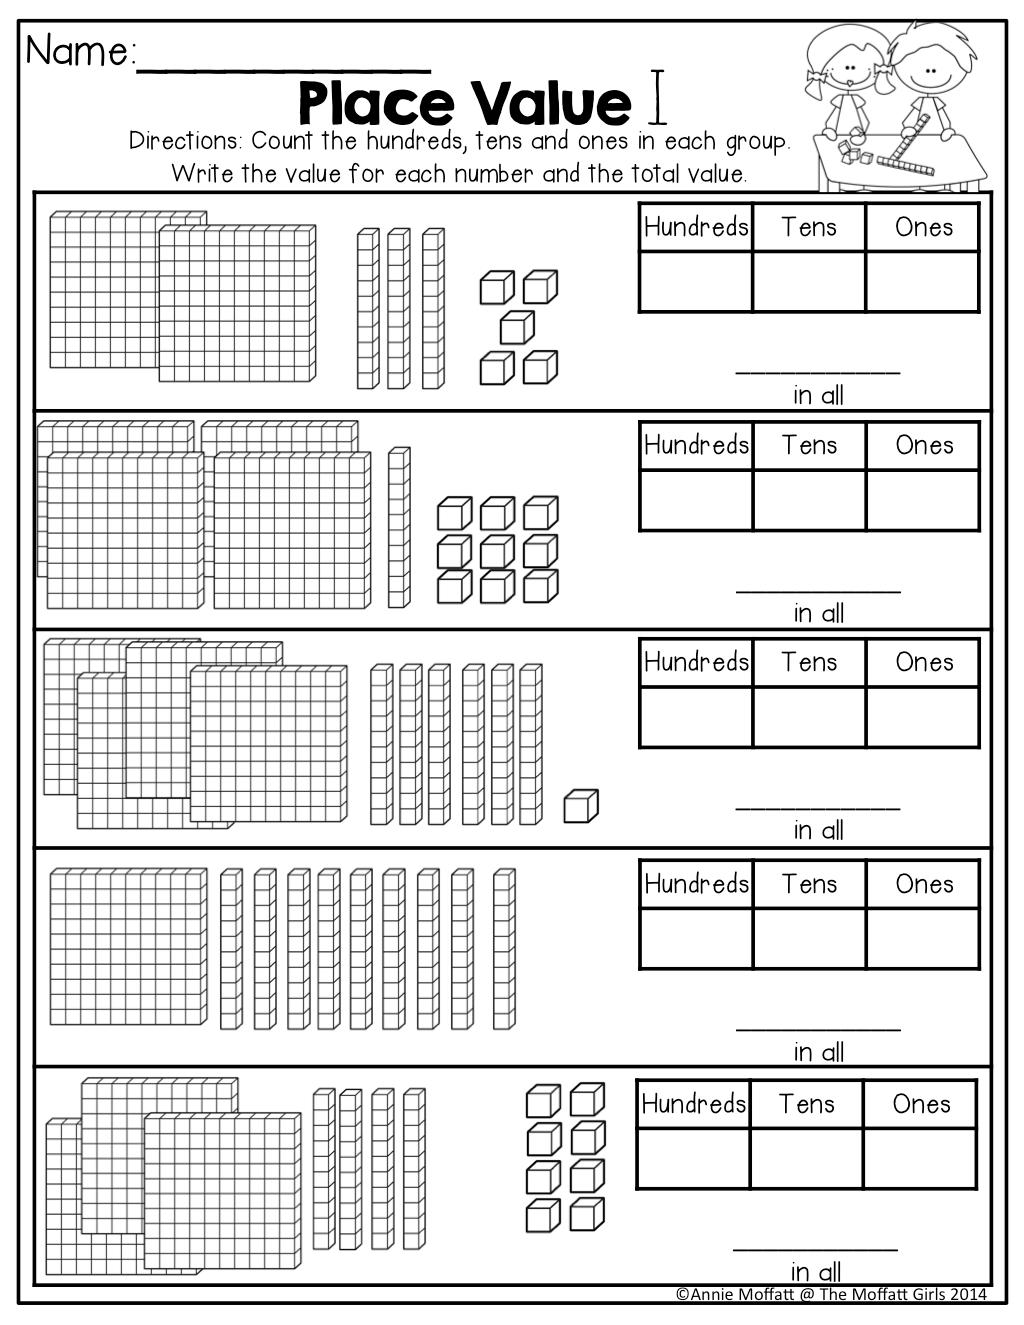 Comfortable Place Value 2nd Grade Worksheet Kidz